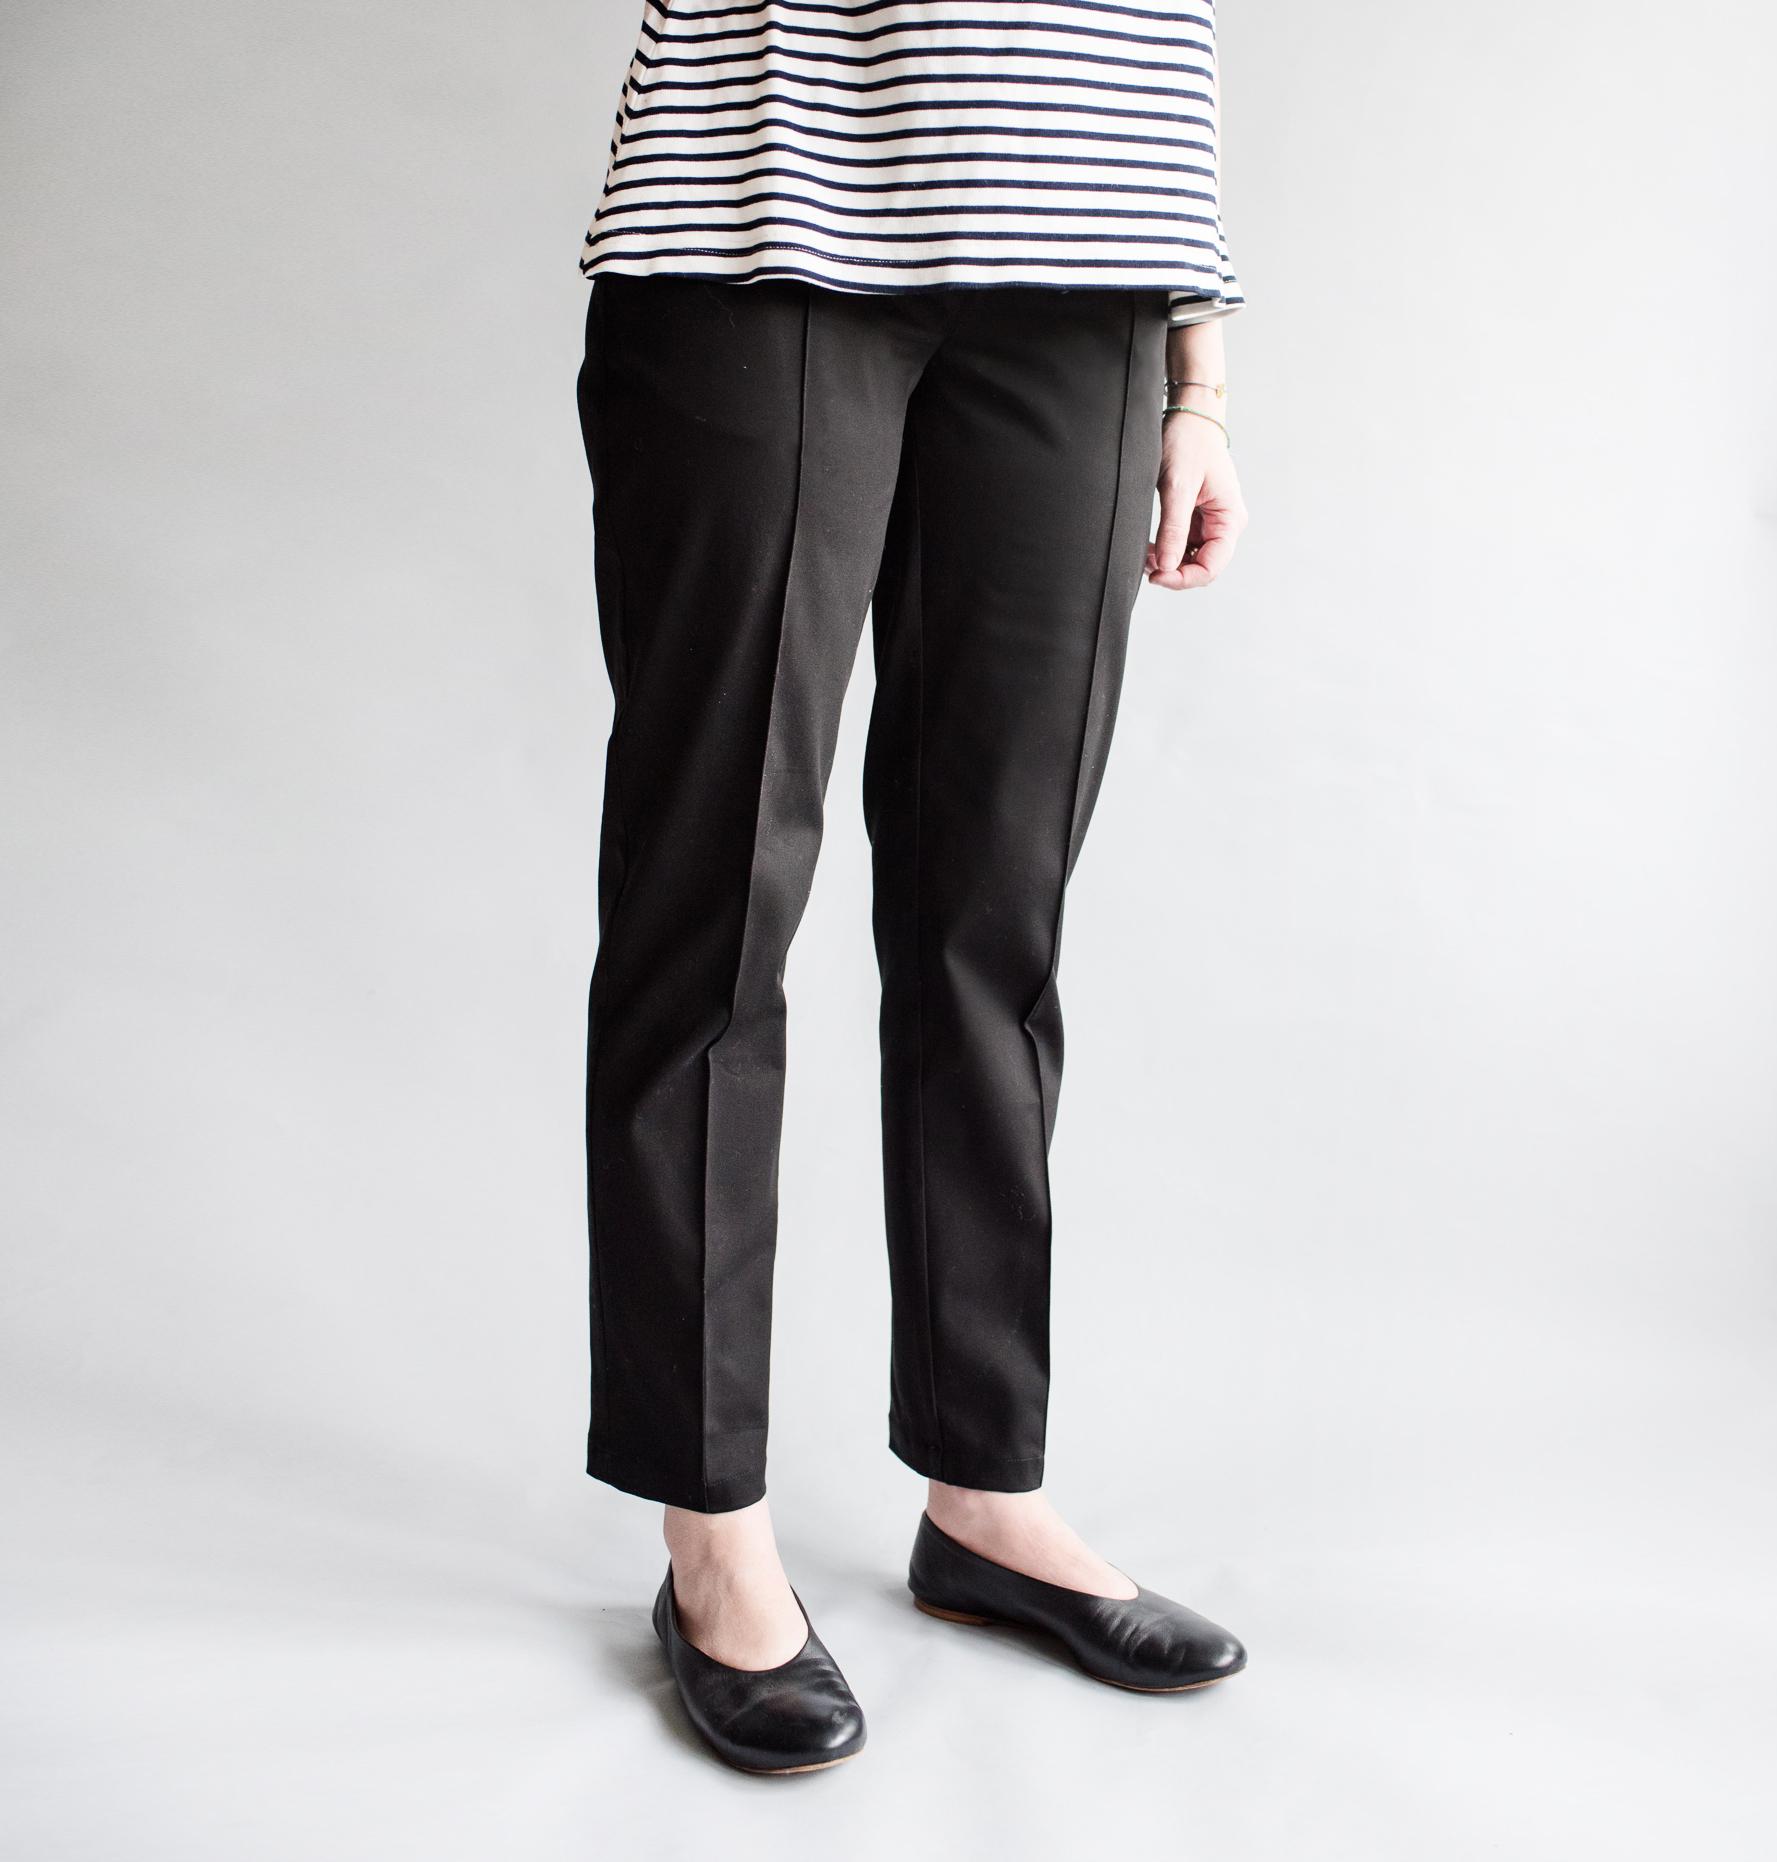 robinson-pdf-sewing-trouser22.jpg